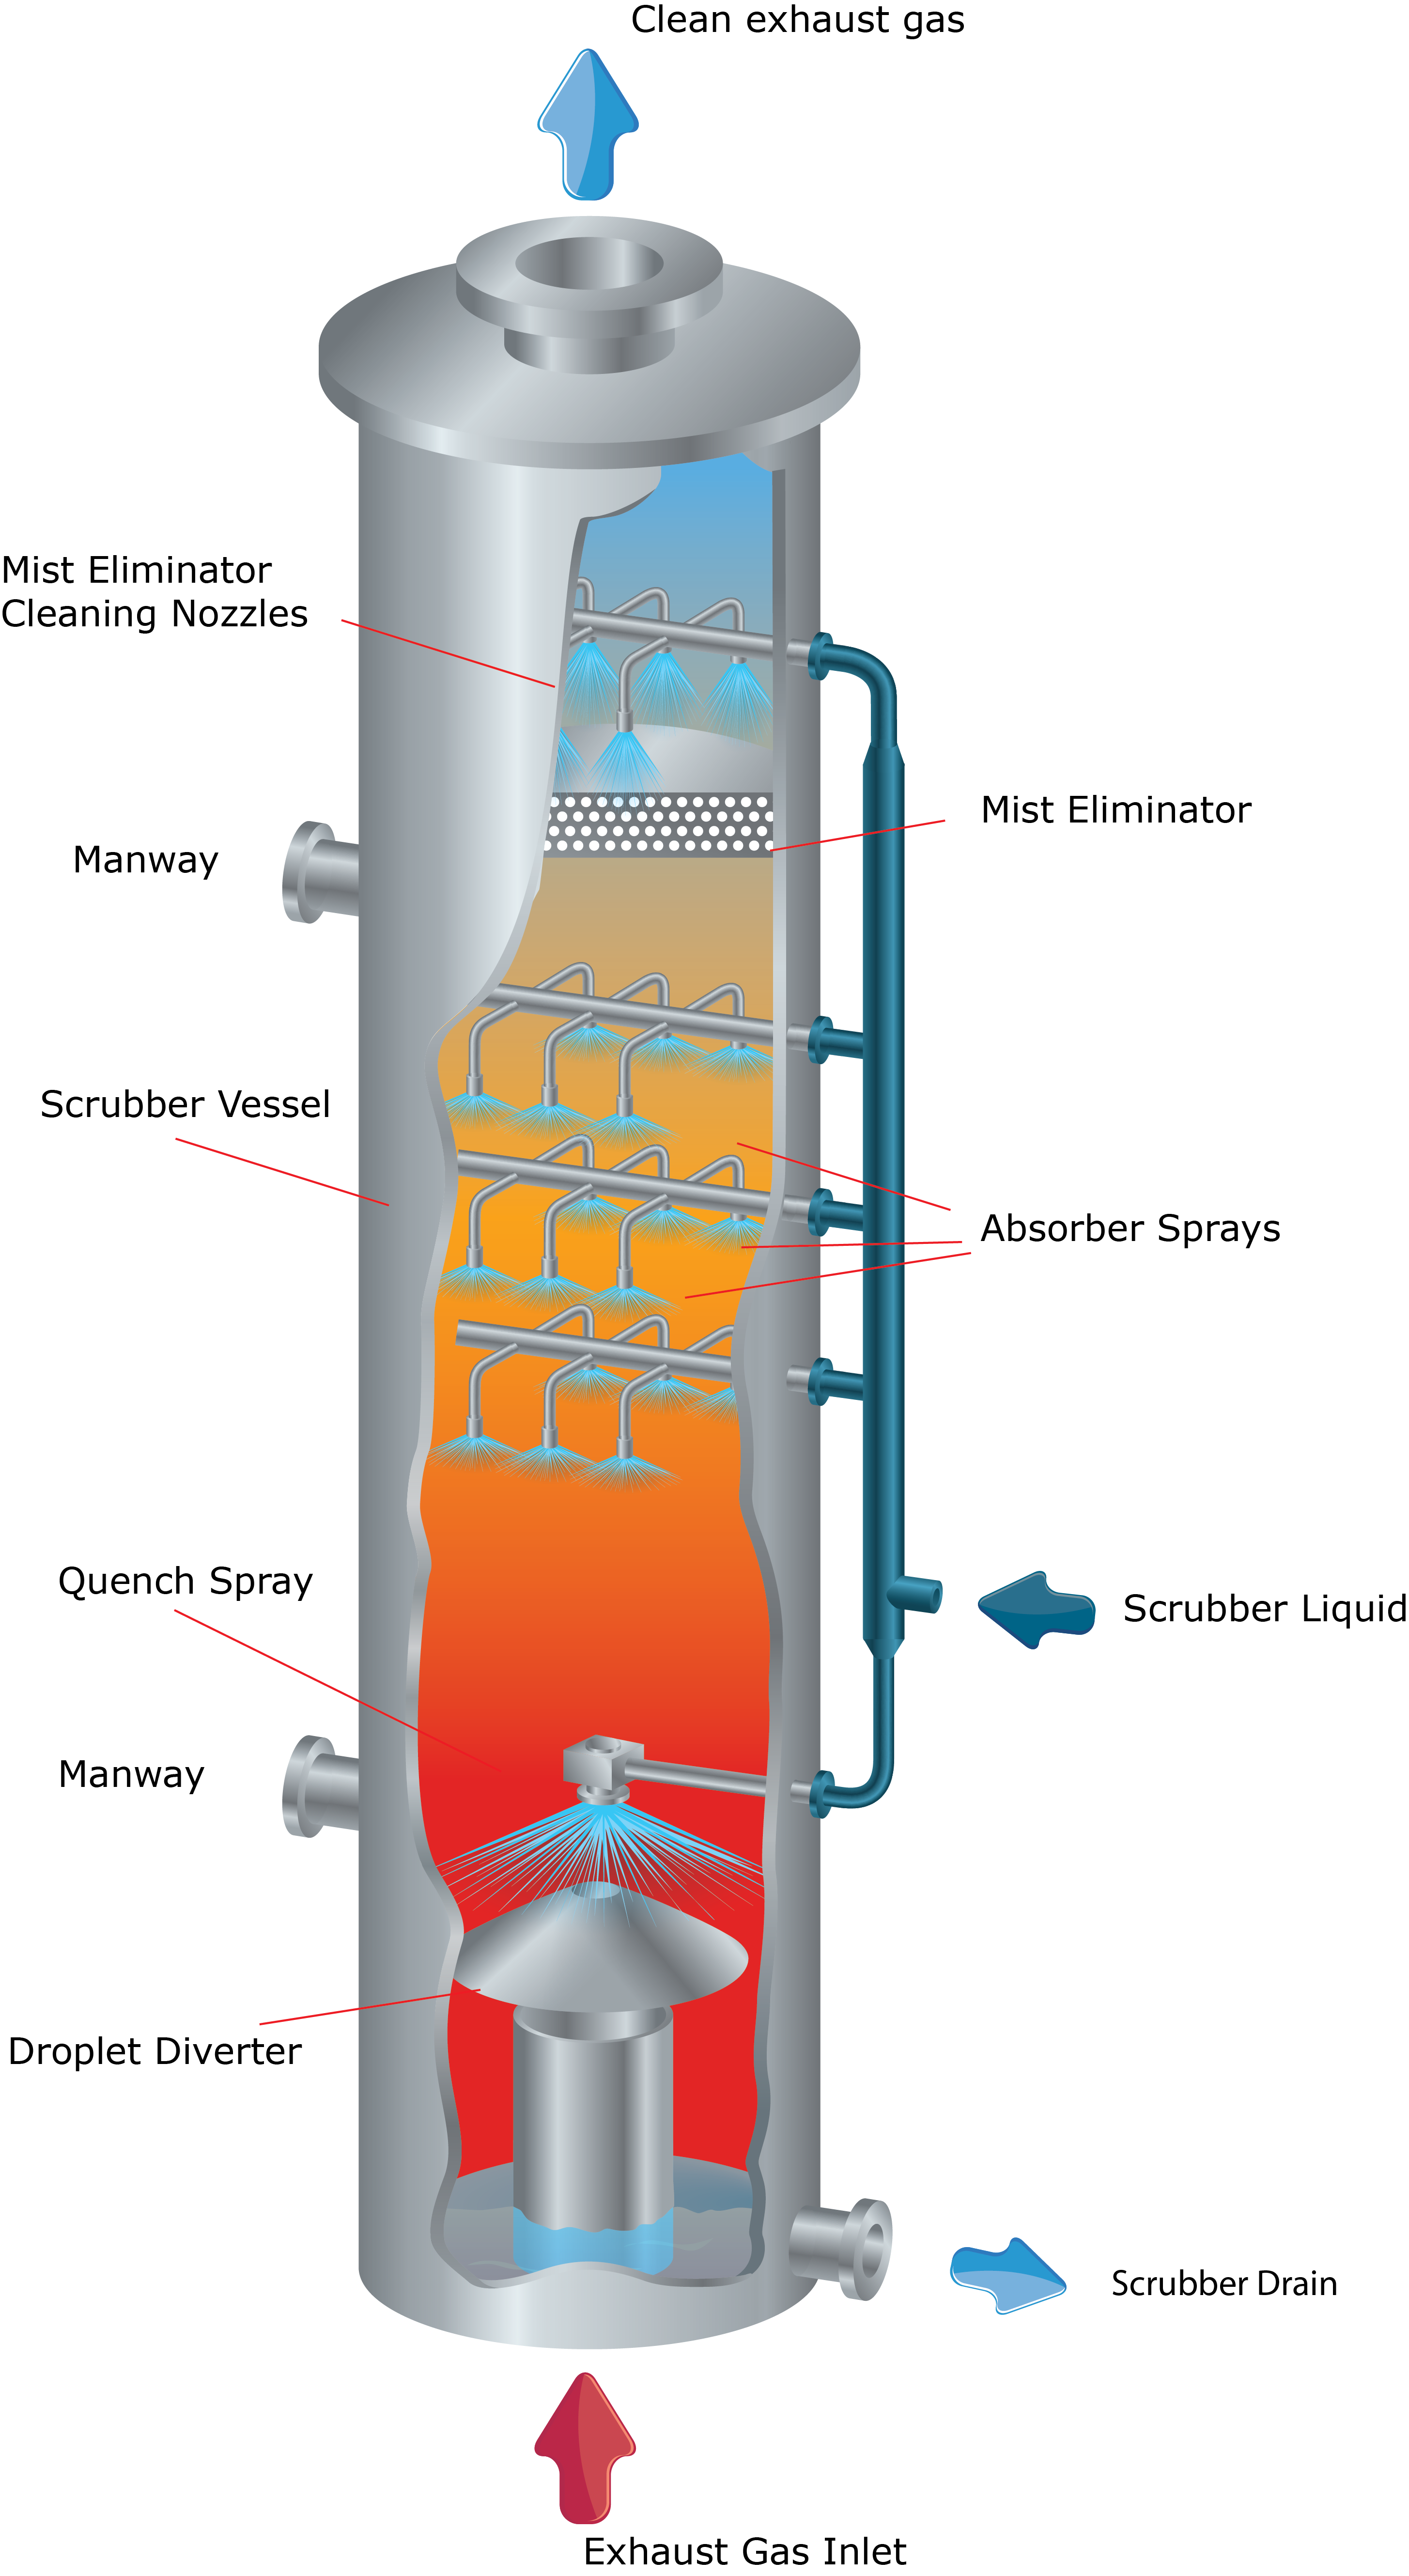 Spray Nozzles for Gas Scrubbing Applications